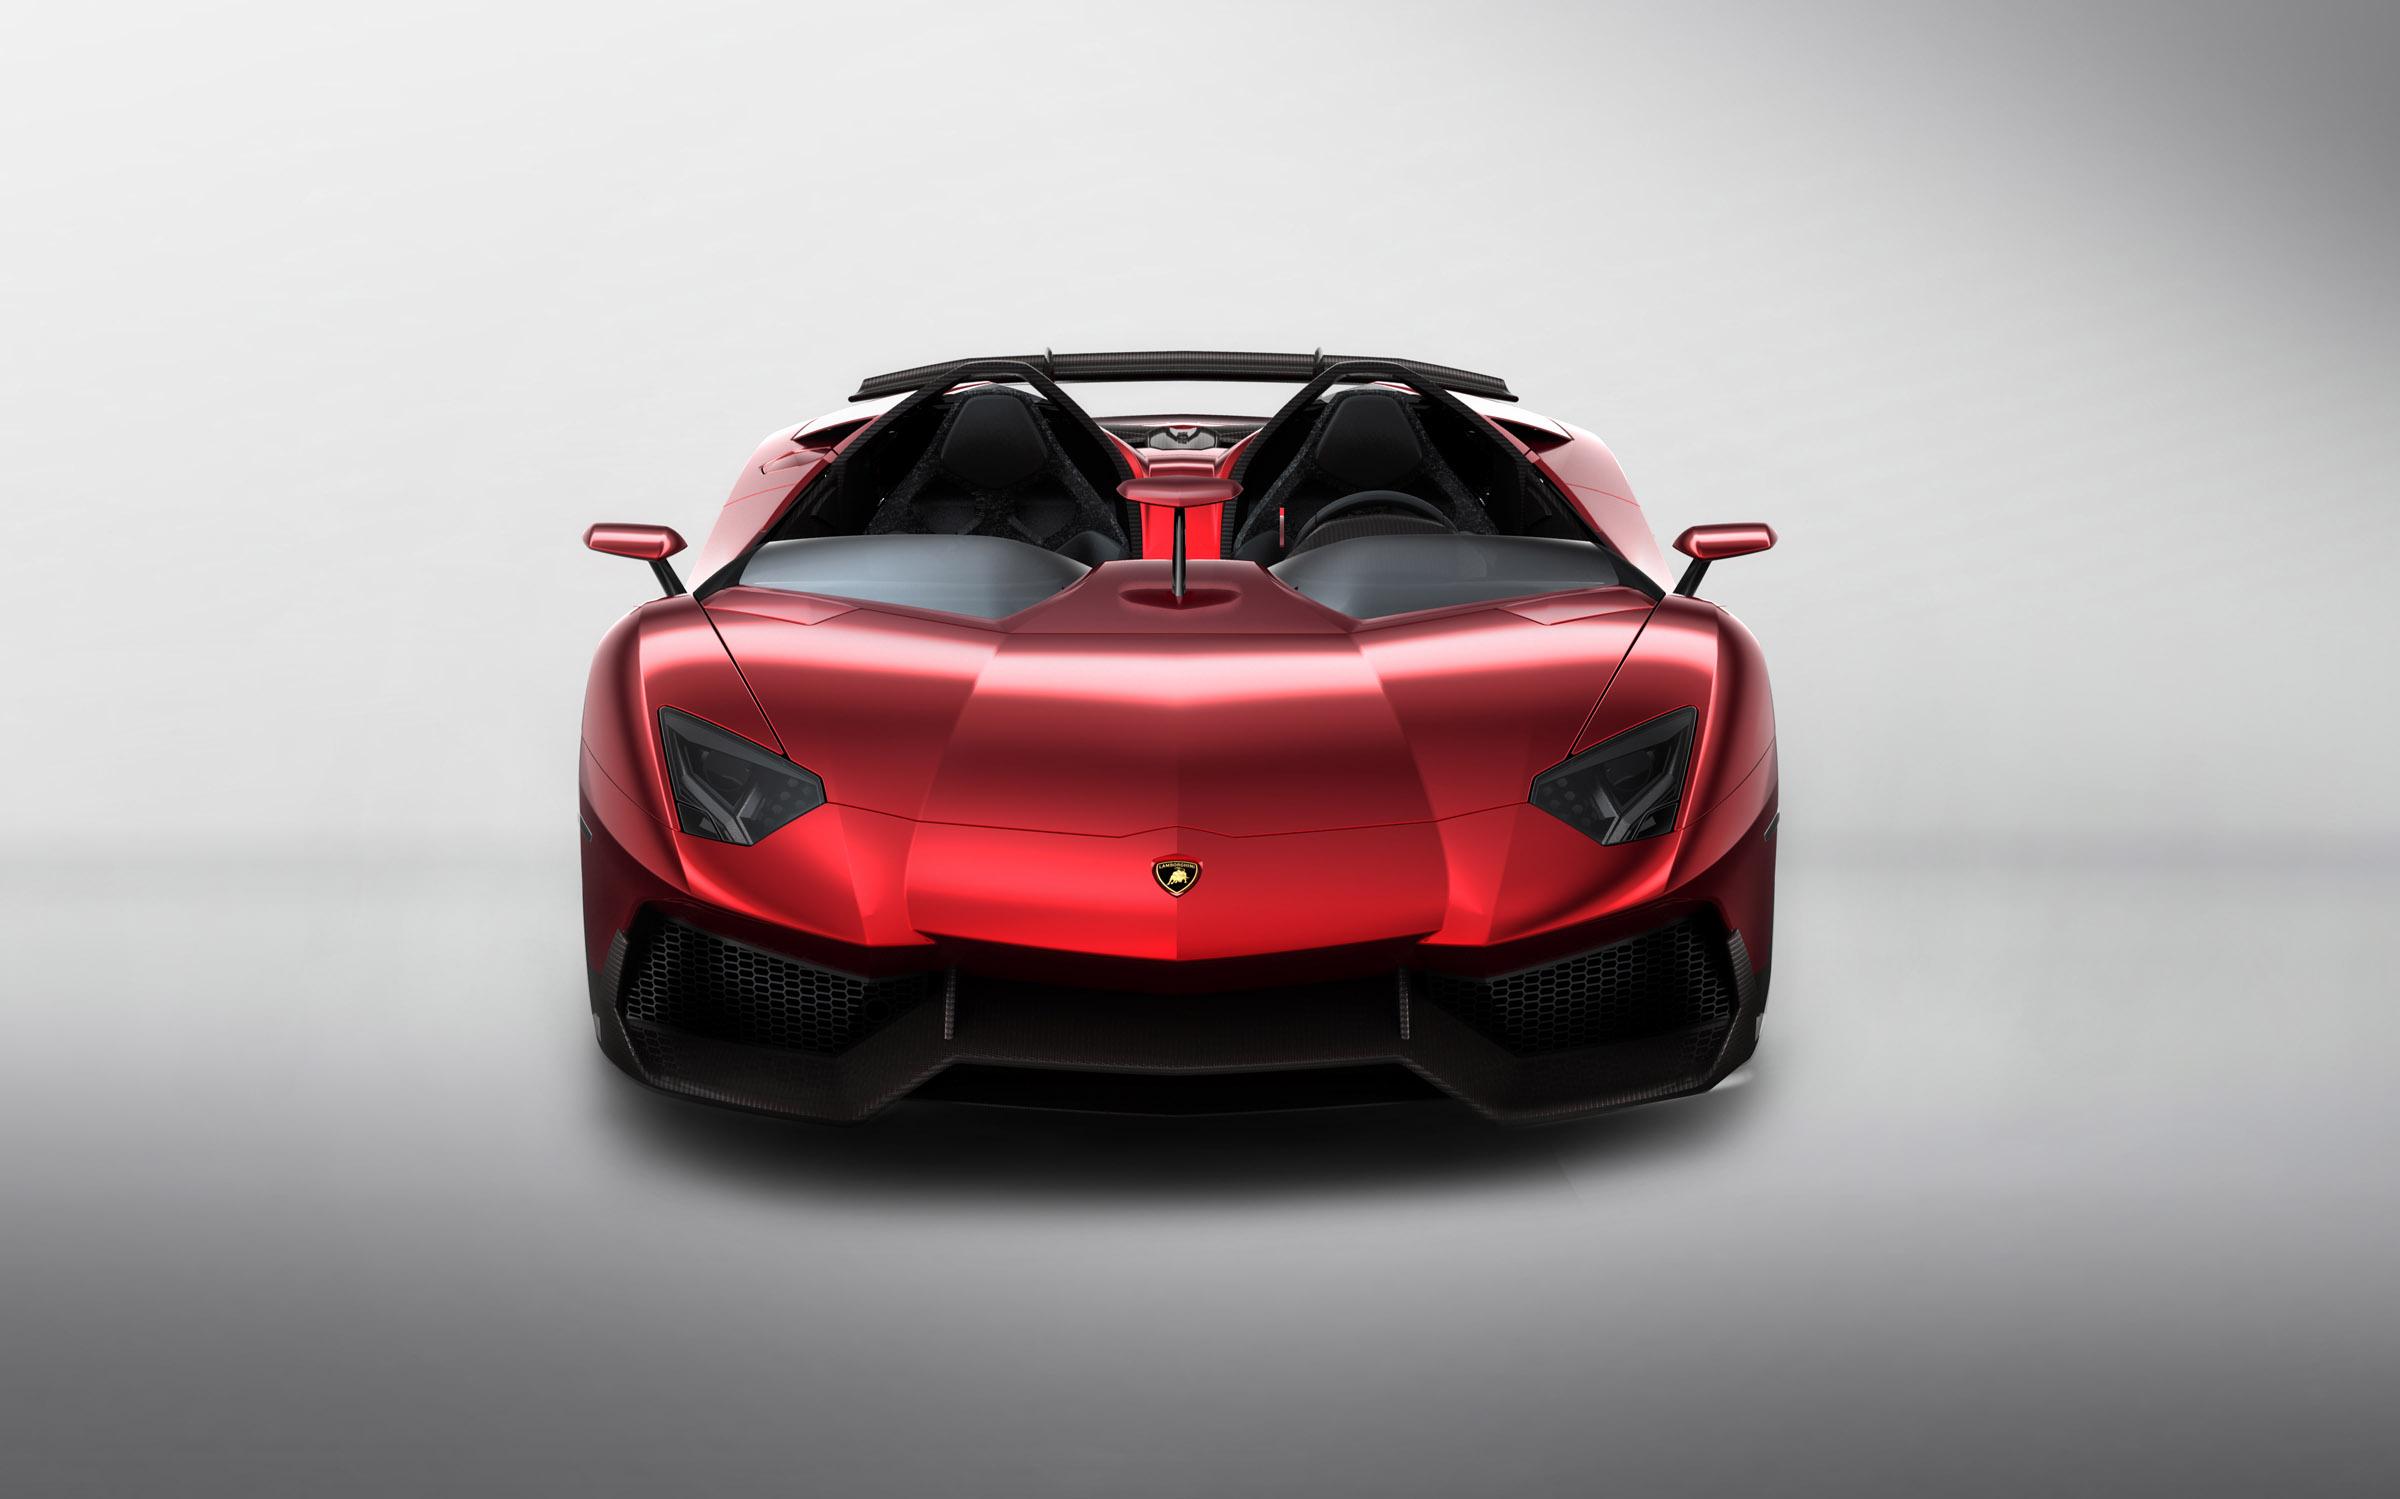 Lamborghini Aventador J Выявлено - фотография №9